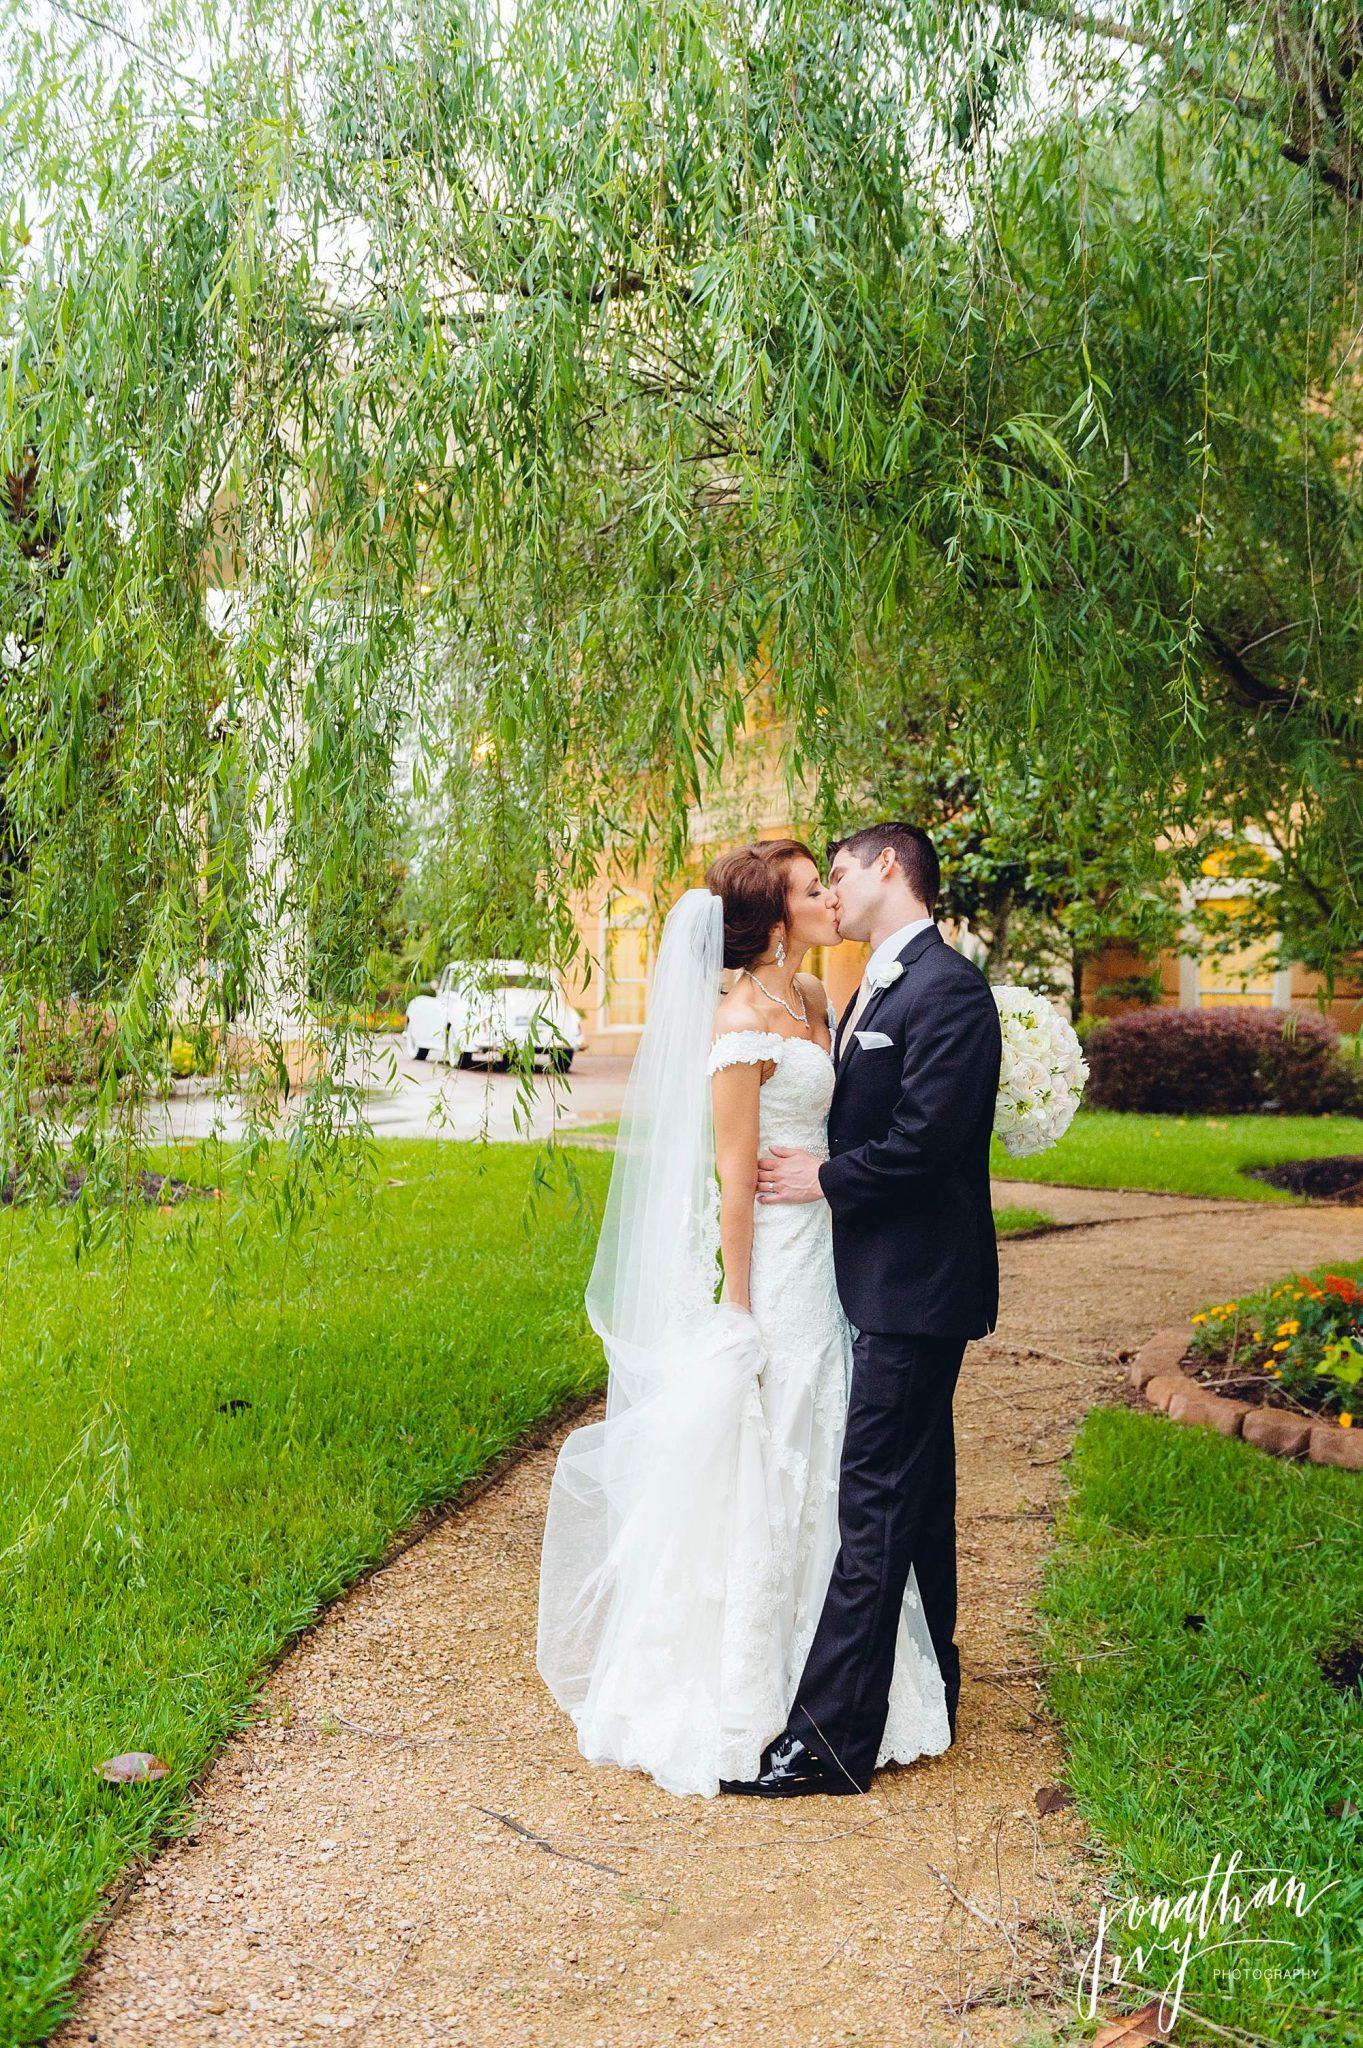 Houston Wedding at Chateau Polonez